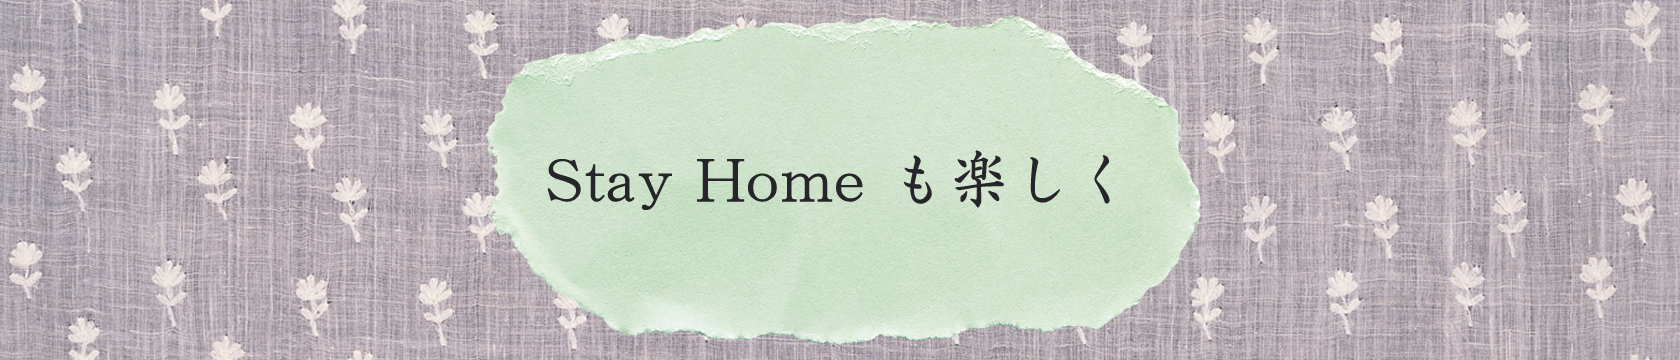 [StayHomeも楽しく]伝統的なテキスタイル図案を塗ってみましょう